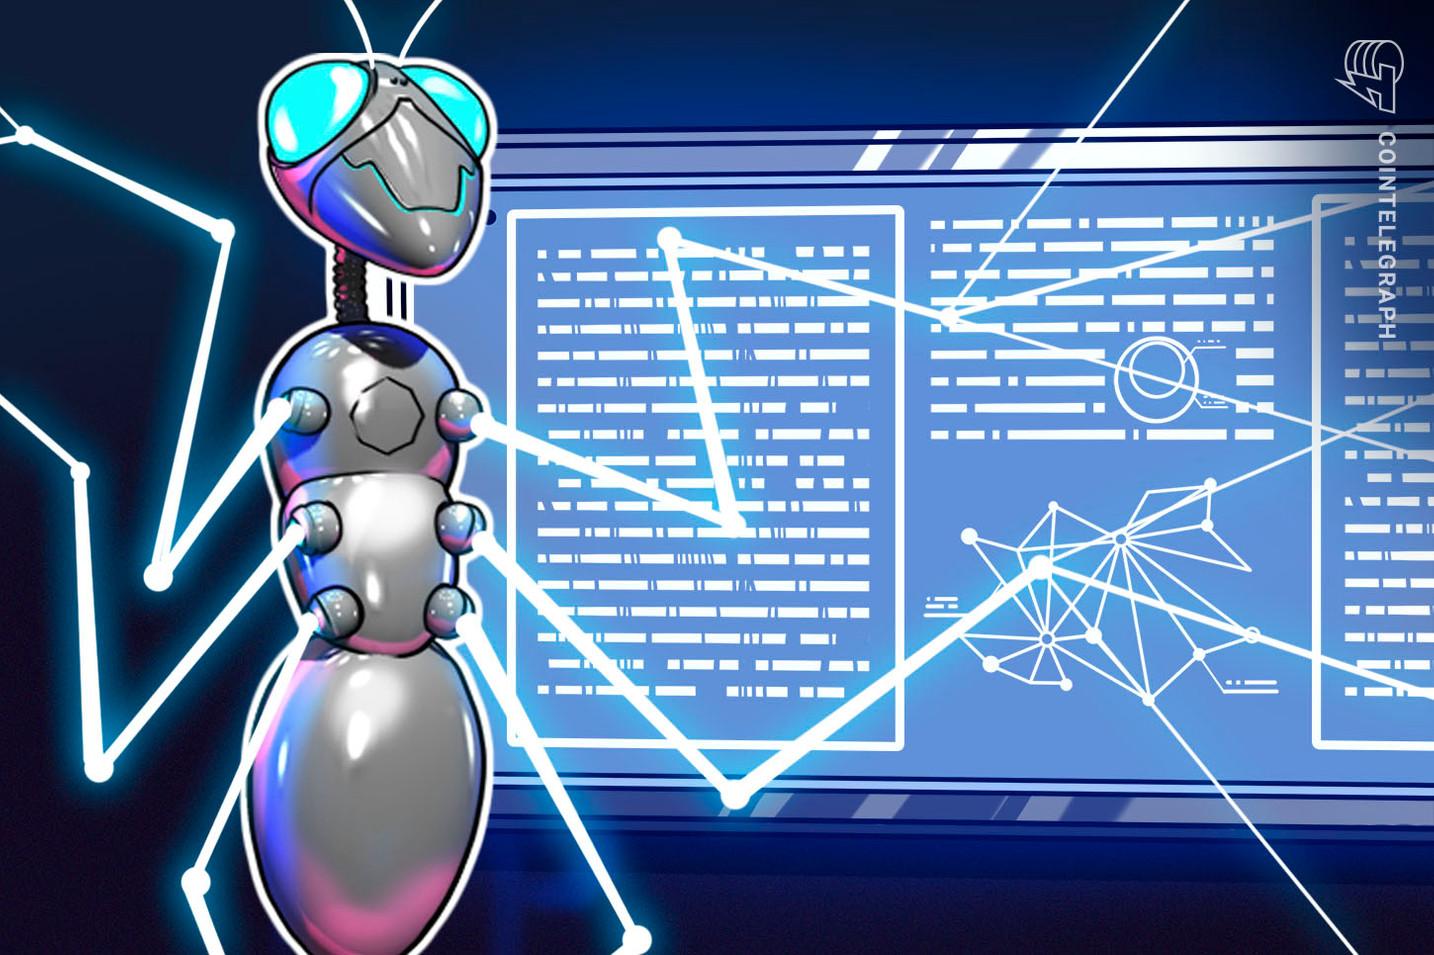 Blockchain-Based Education Platform Offered to Schools Struck by Coronavirus